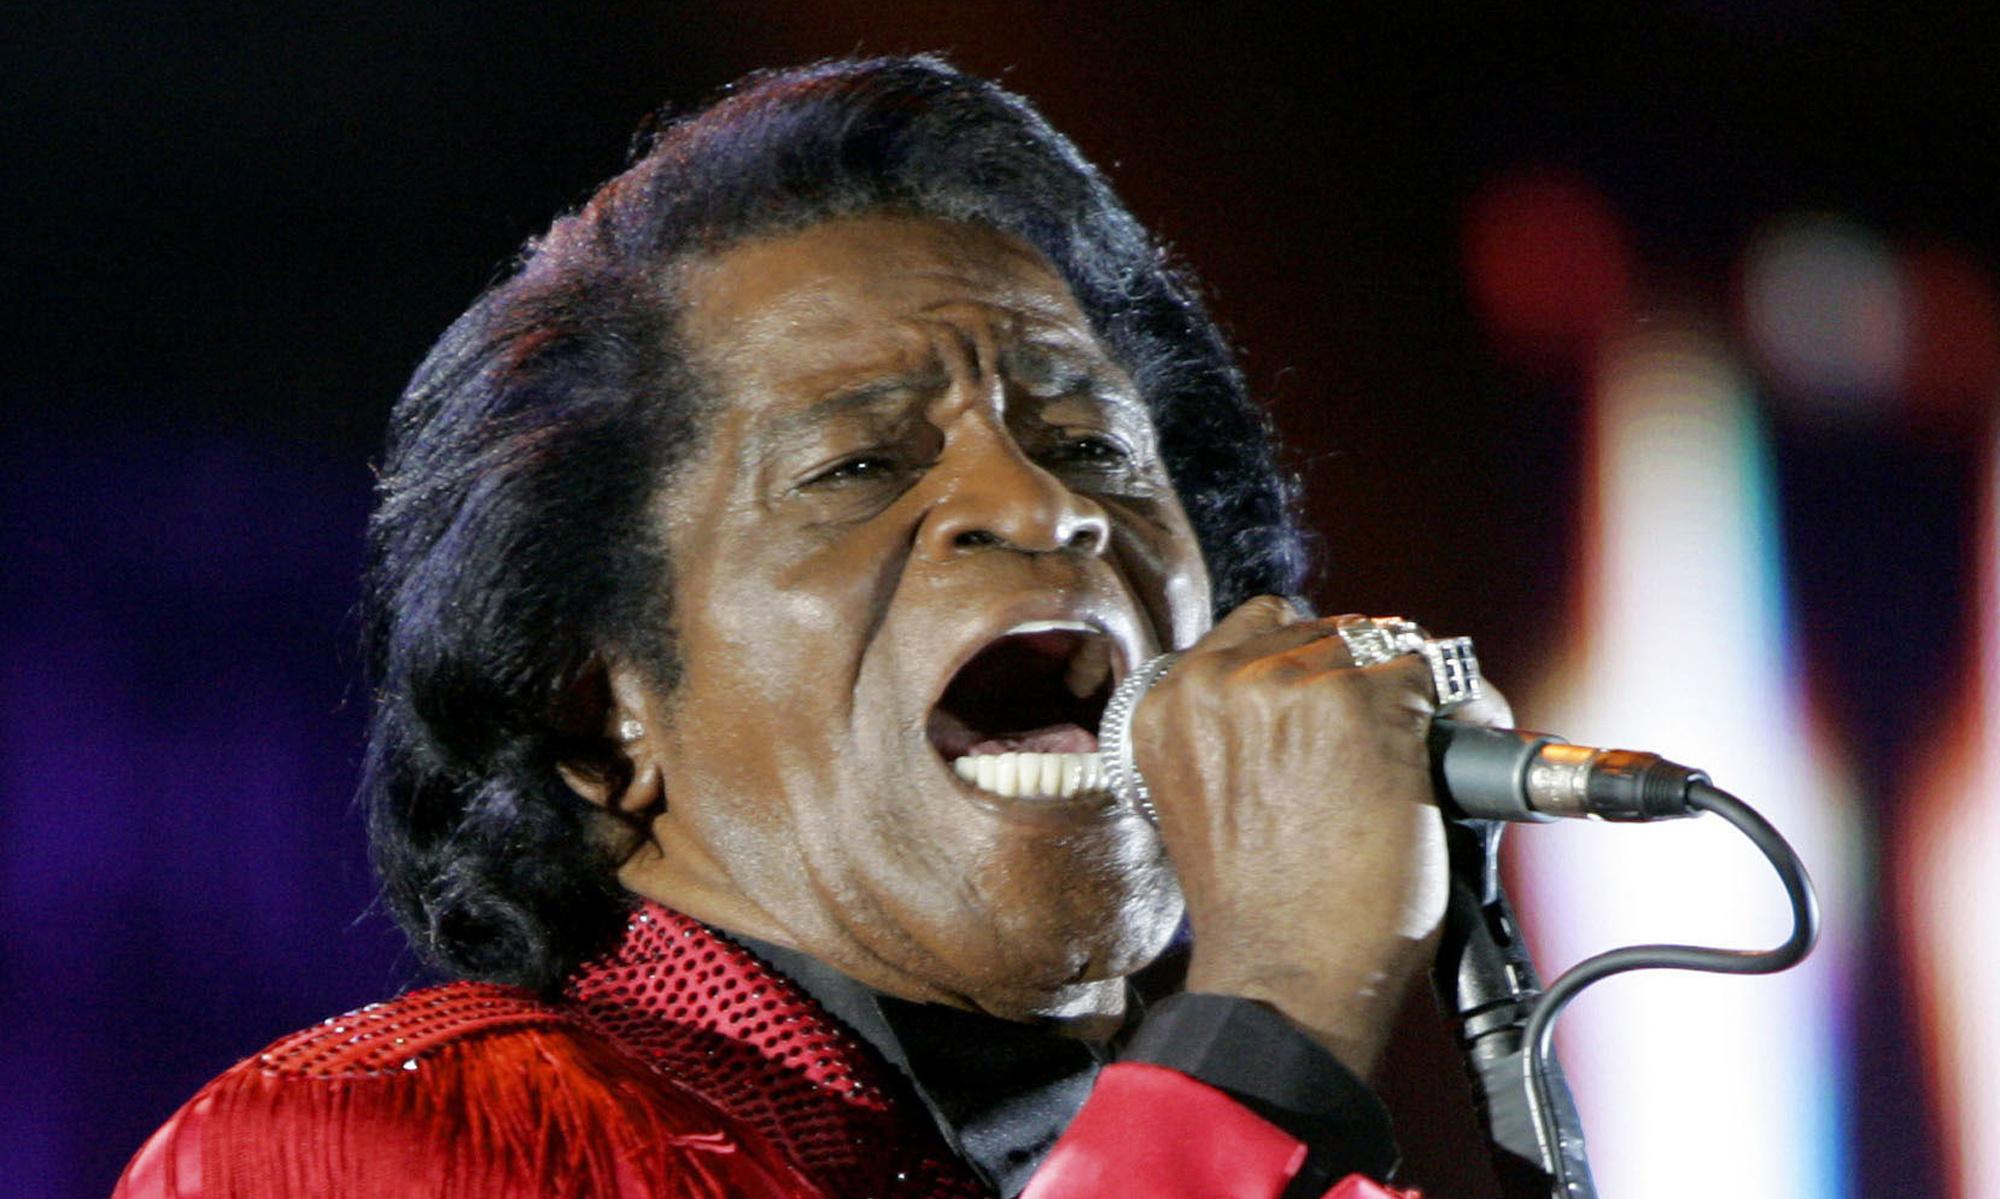 James Brown: prosecutor may investigate claim singer was murdered